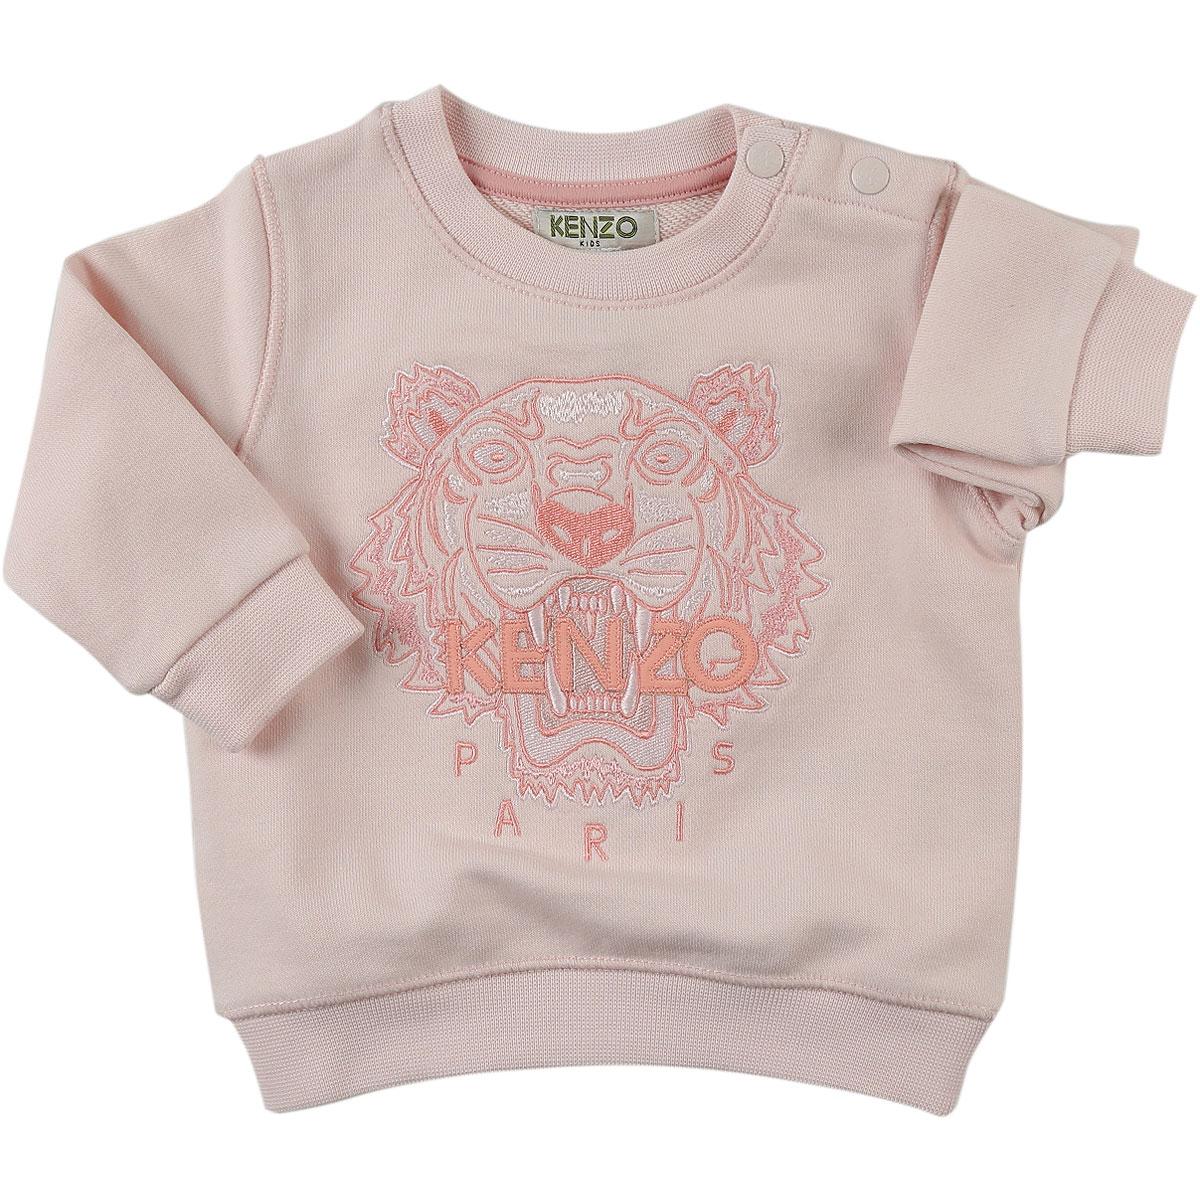 Image of Kenzo Baby Sweatshirts & Hoodies for Girls, Pink, Cotton, 2017, 12M 6M 9M